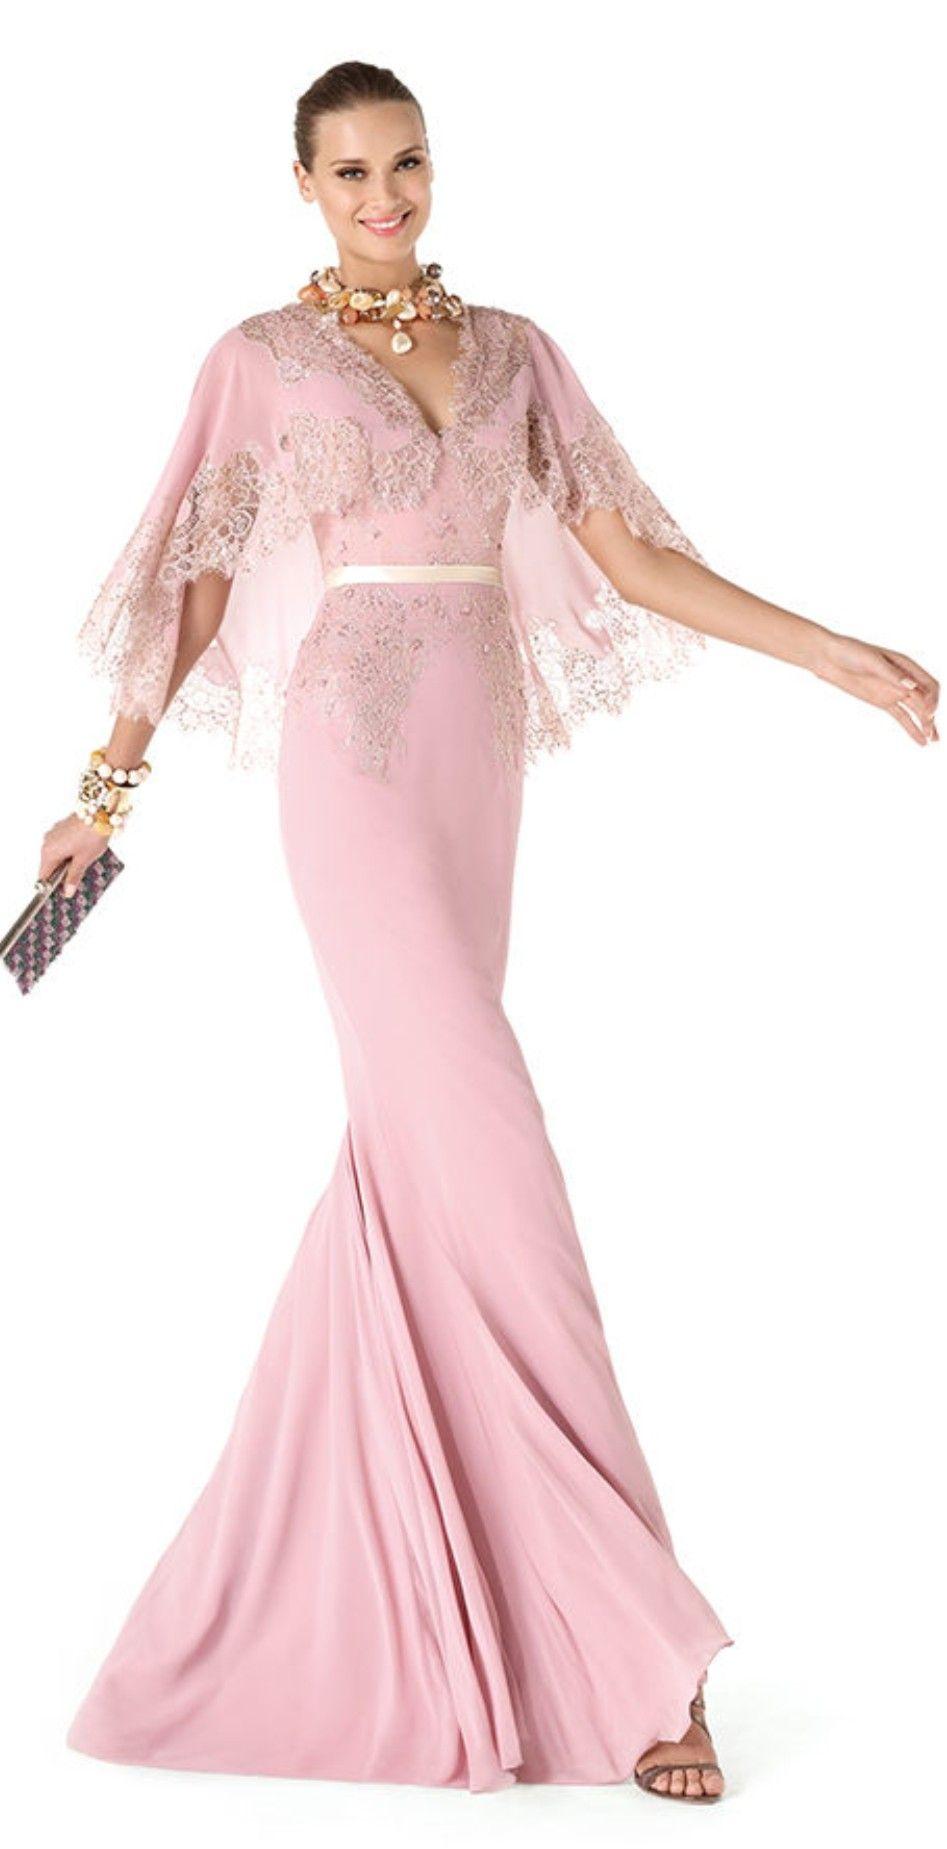 Pronovias 2014 glamour gown | ❤ Palest Pink ❤ | Pinterest ...